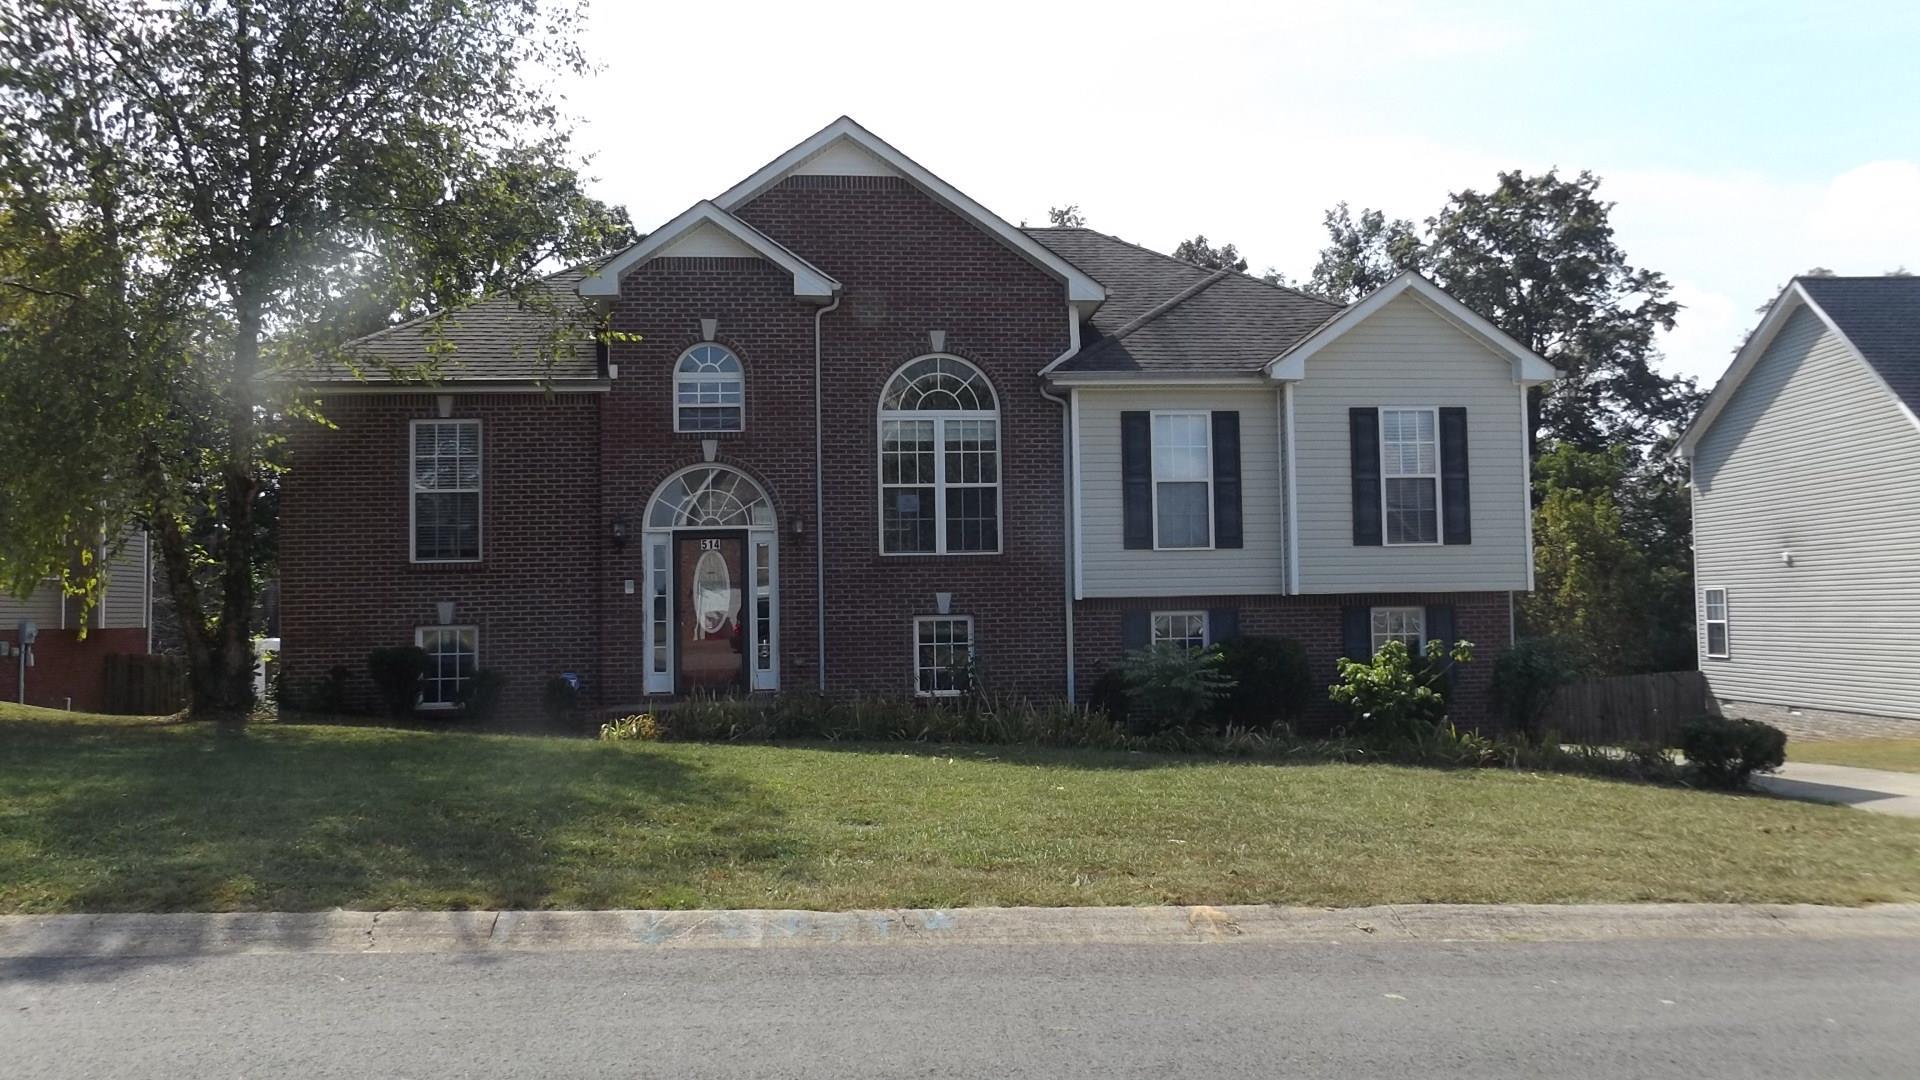 514 Winding Bluff Way, Clarksville, TN 37040 - Clarksville, TN real estate listing